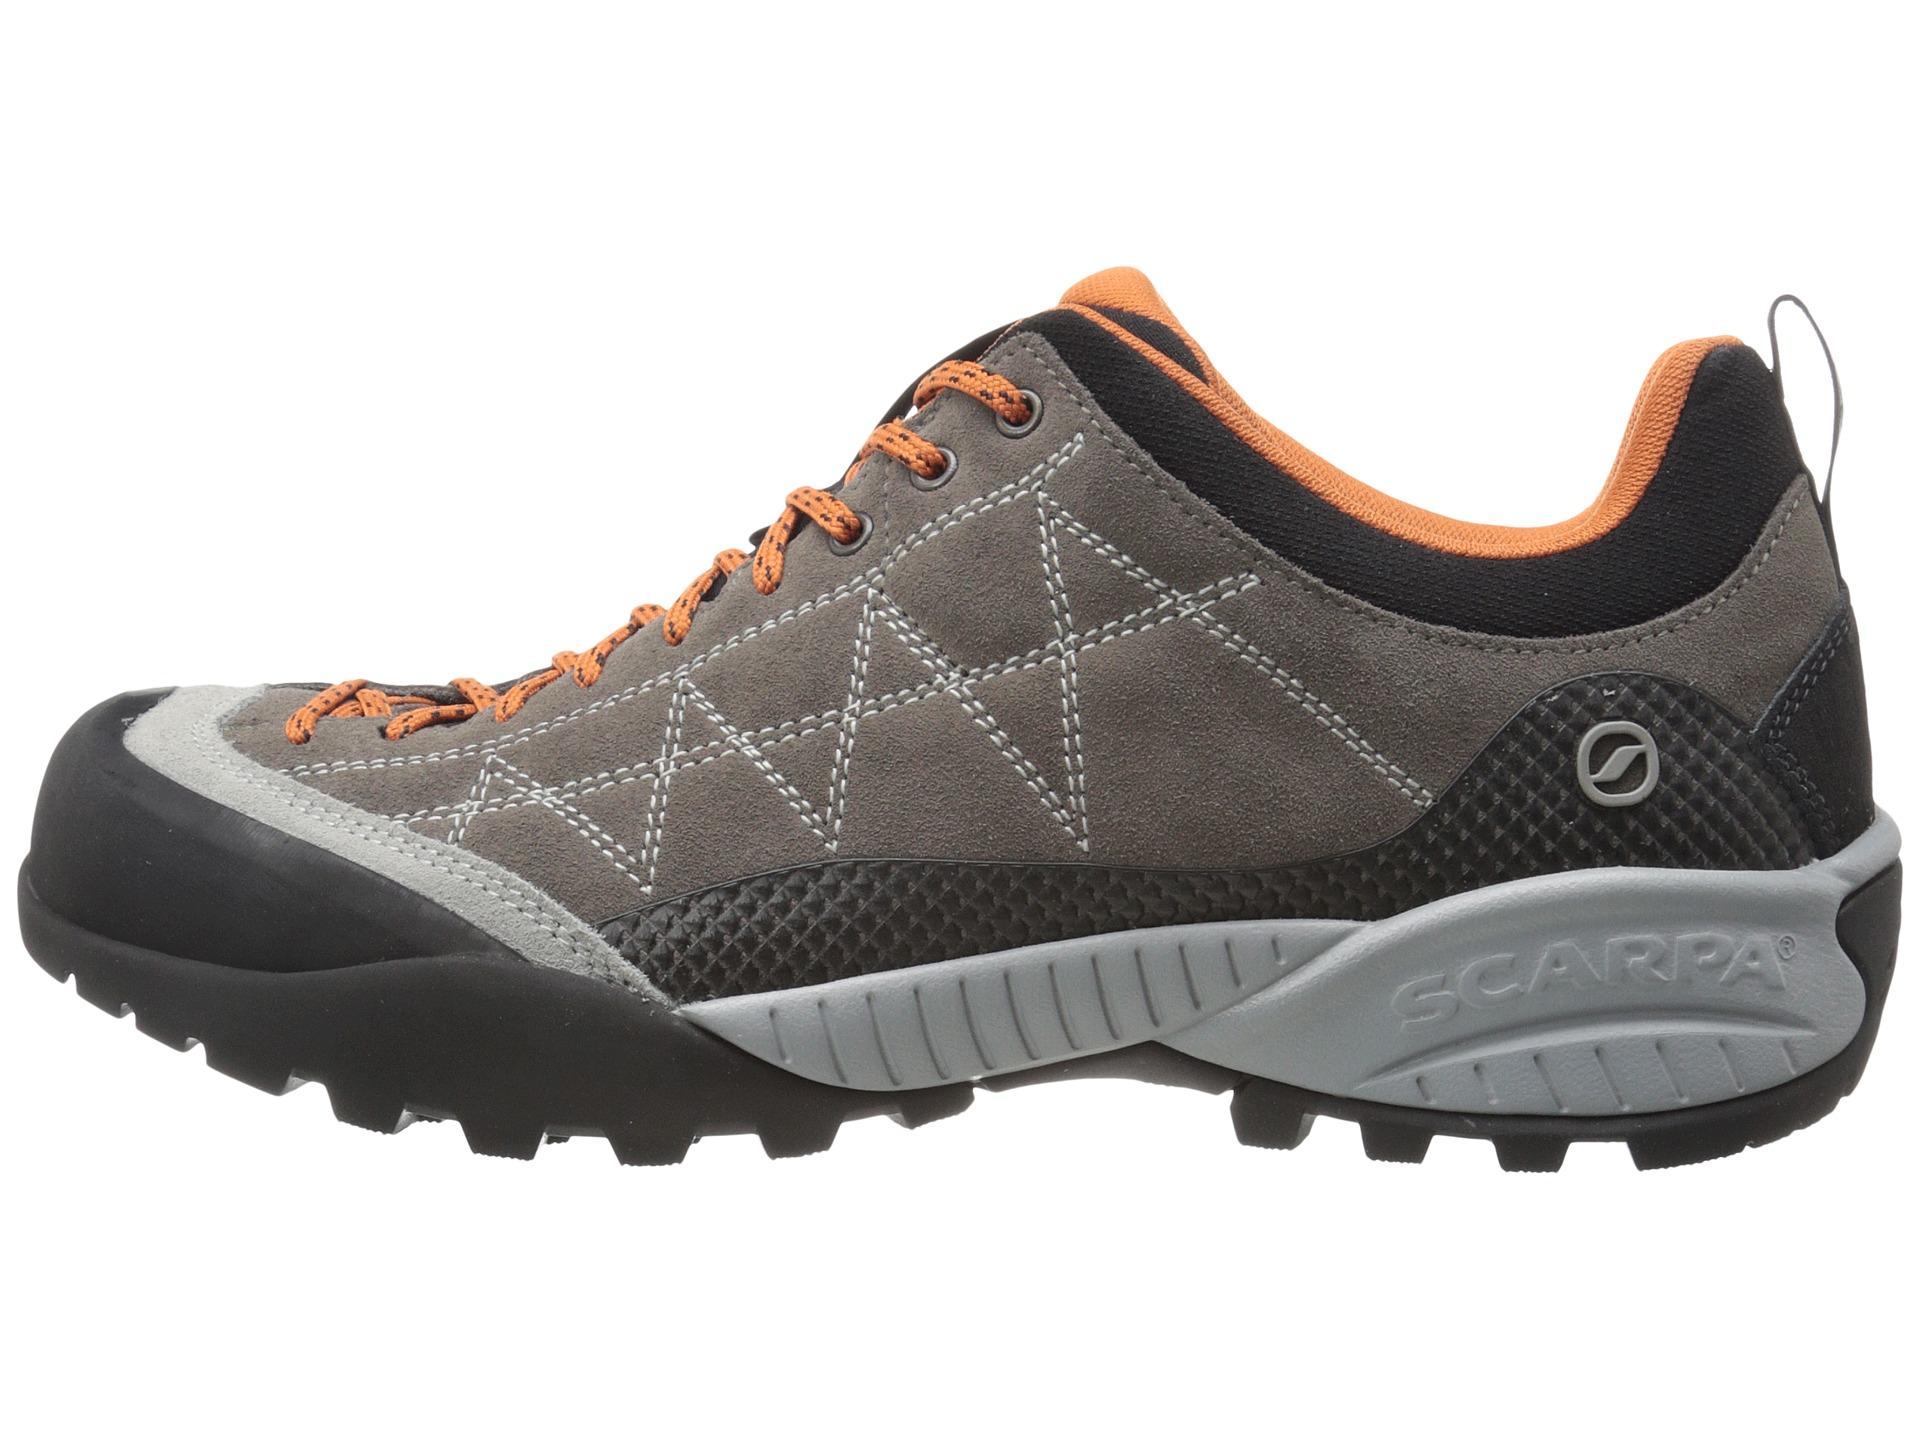 Scarpa Zen Pro Shoe Men